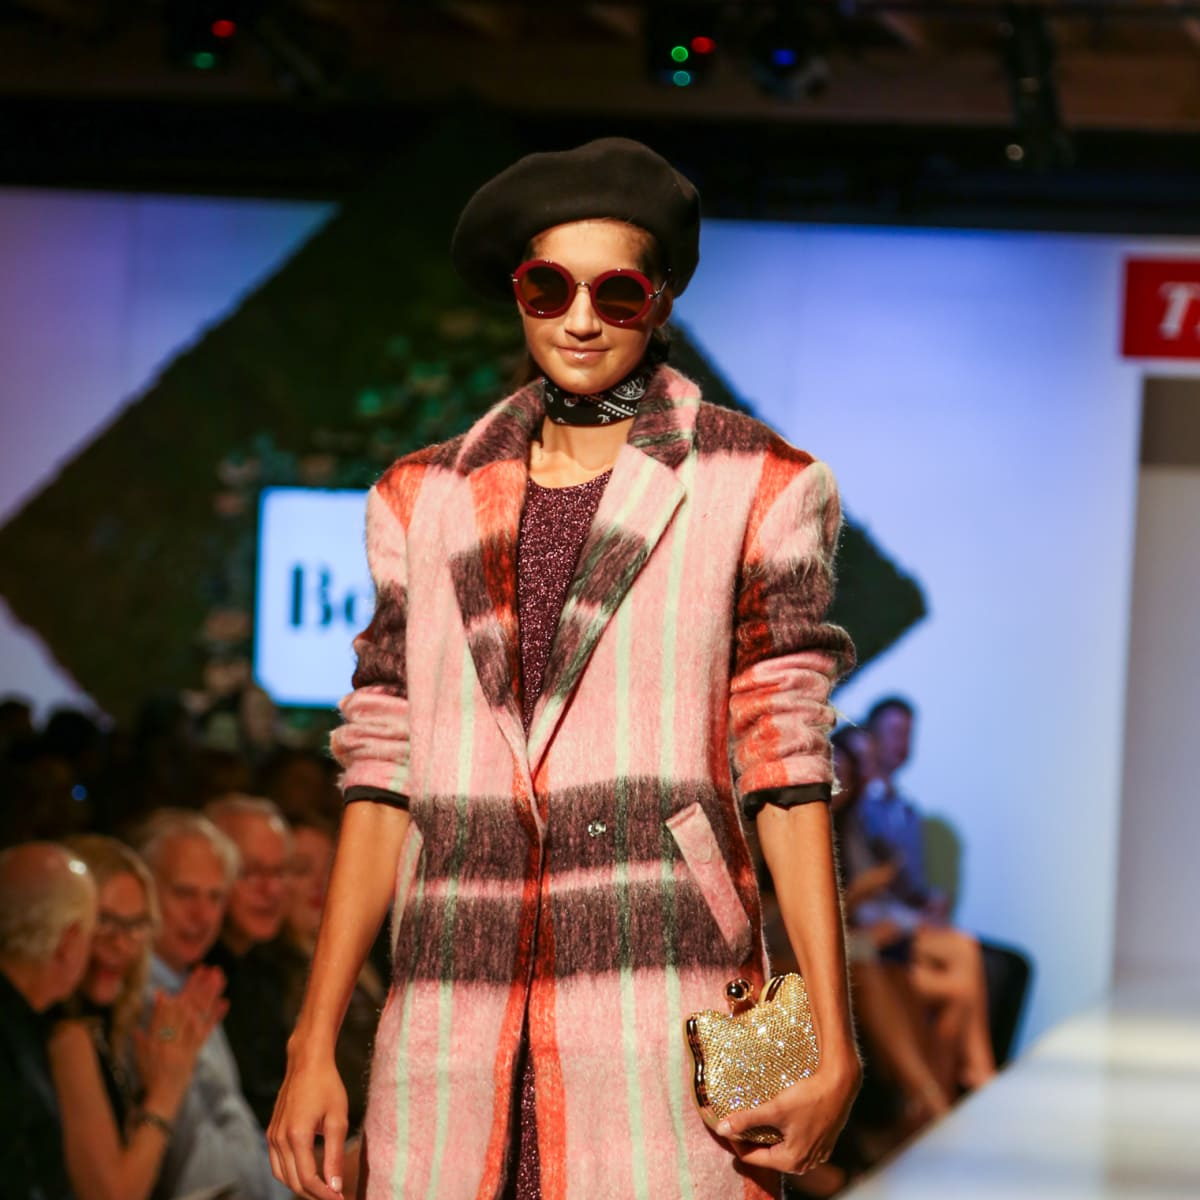 Tribeza Fashion Show 2015 at Brazos Hall Beehive